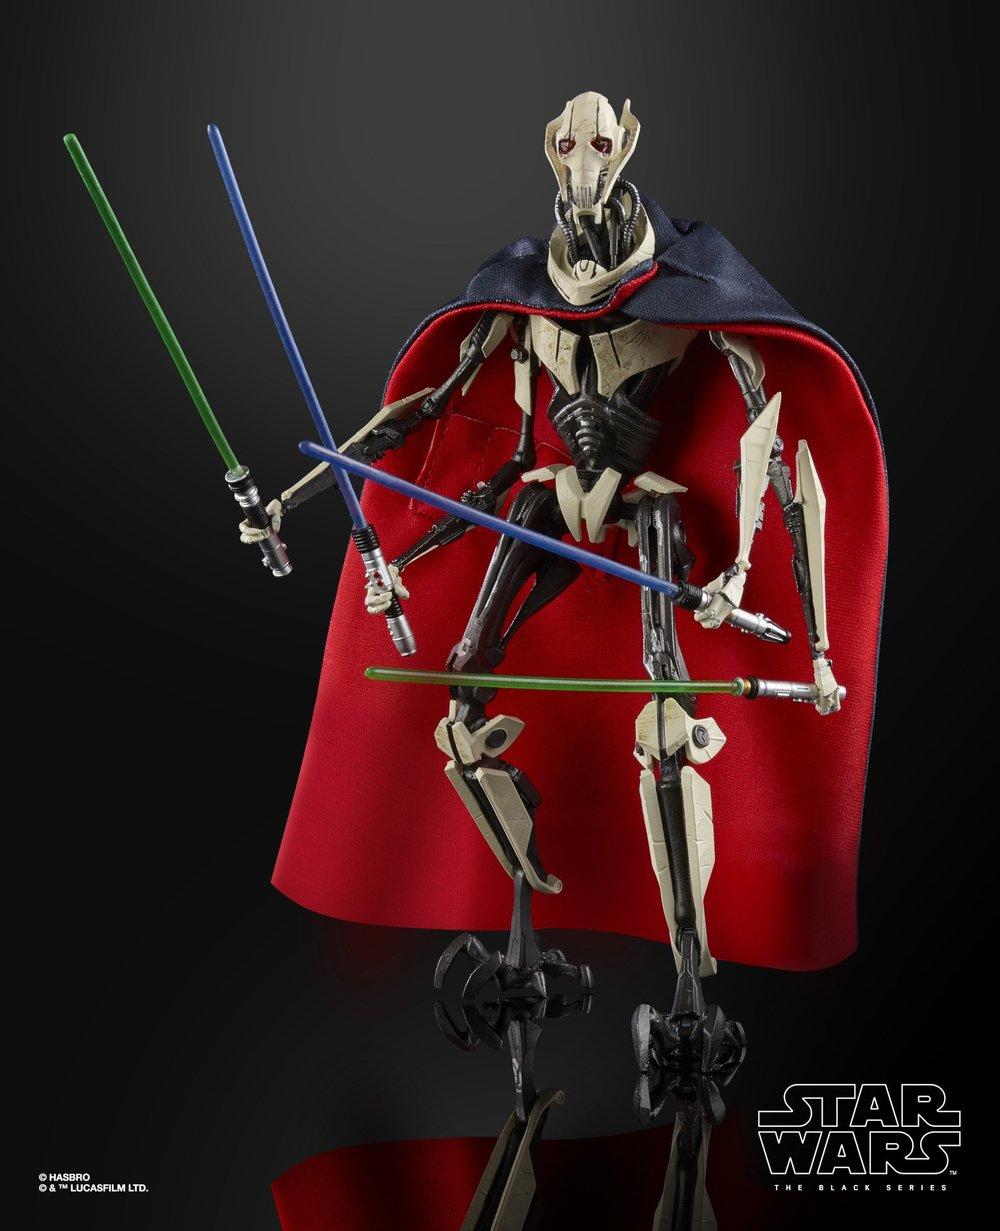 Star-Wars-The-Black-Series-6-inch-General-Grievous-Figure-Promo-02.jpg